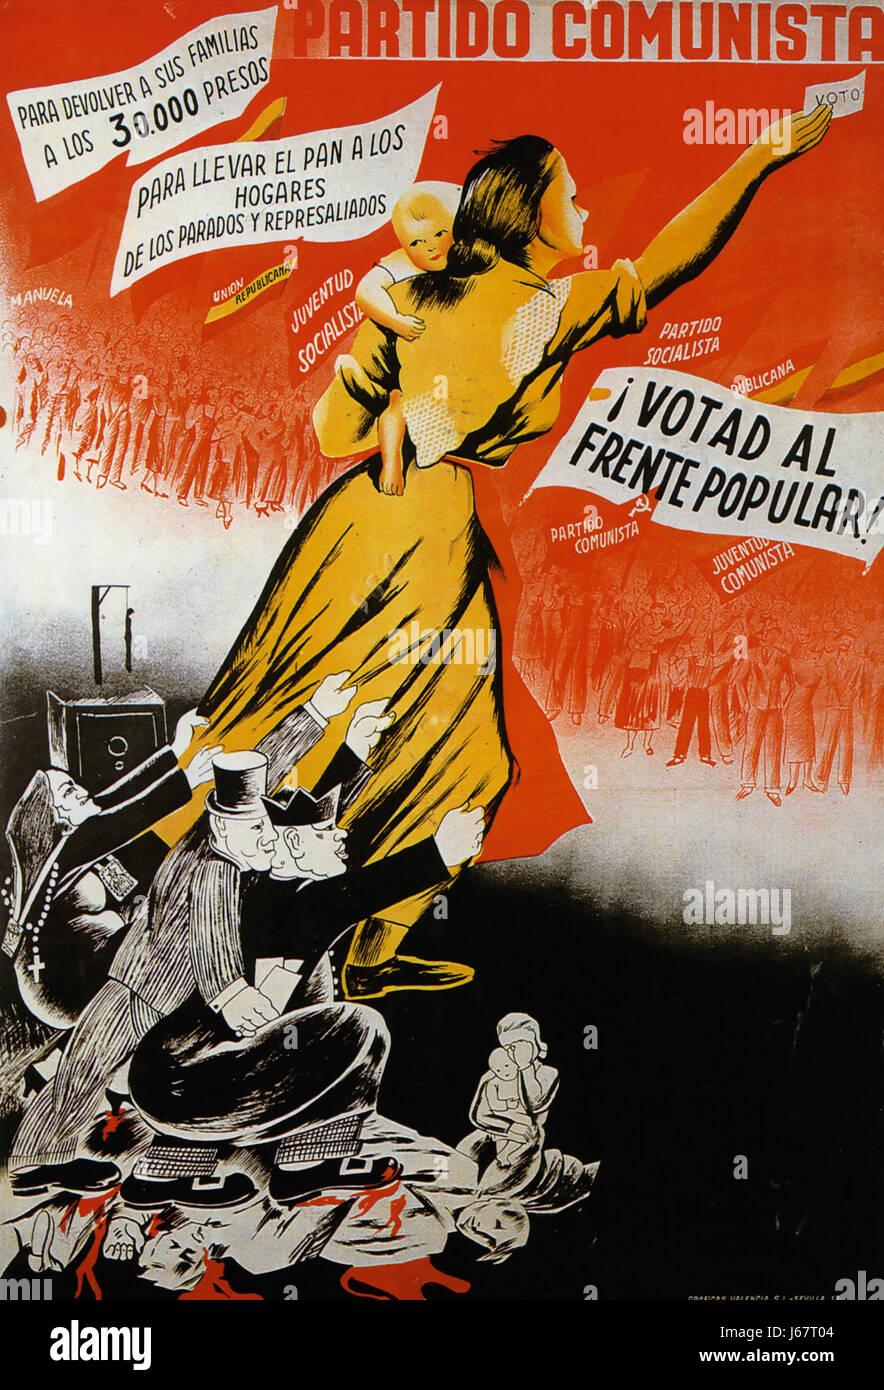 WAR SPANISH CIVIL CNT COMMUNIST HEROES SPAIN Poster Vintage Advertising